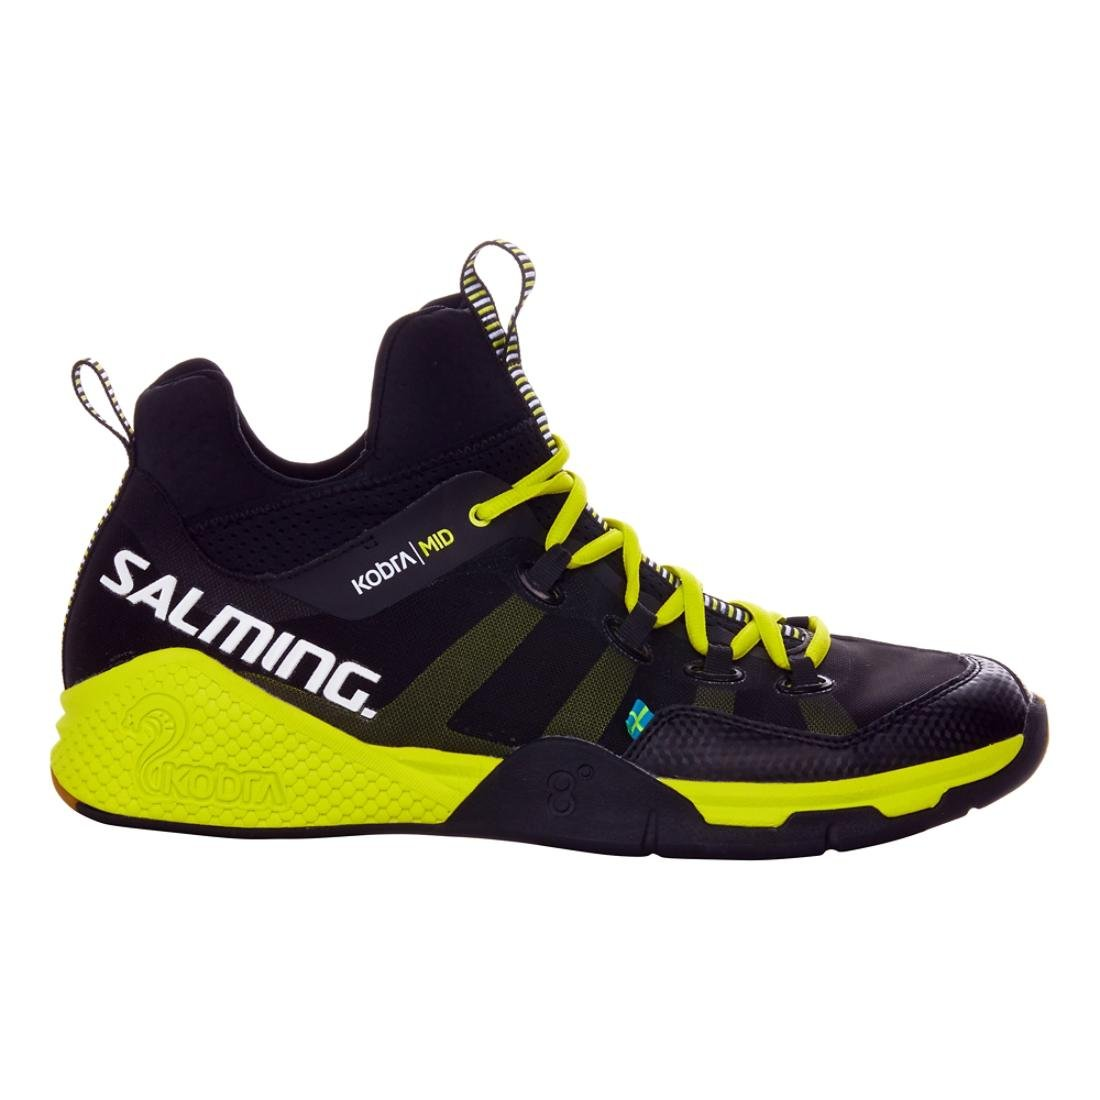 Salming Kobra Mid Men's Indoor Court schuhe schuhe schuhe 9db8c7